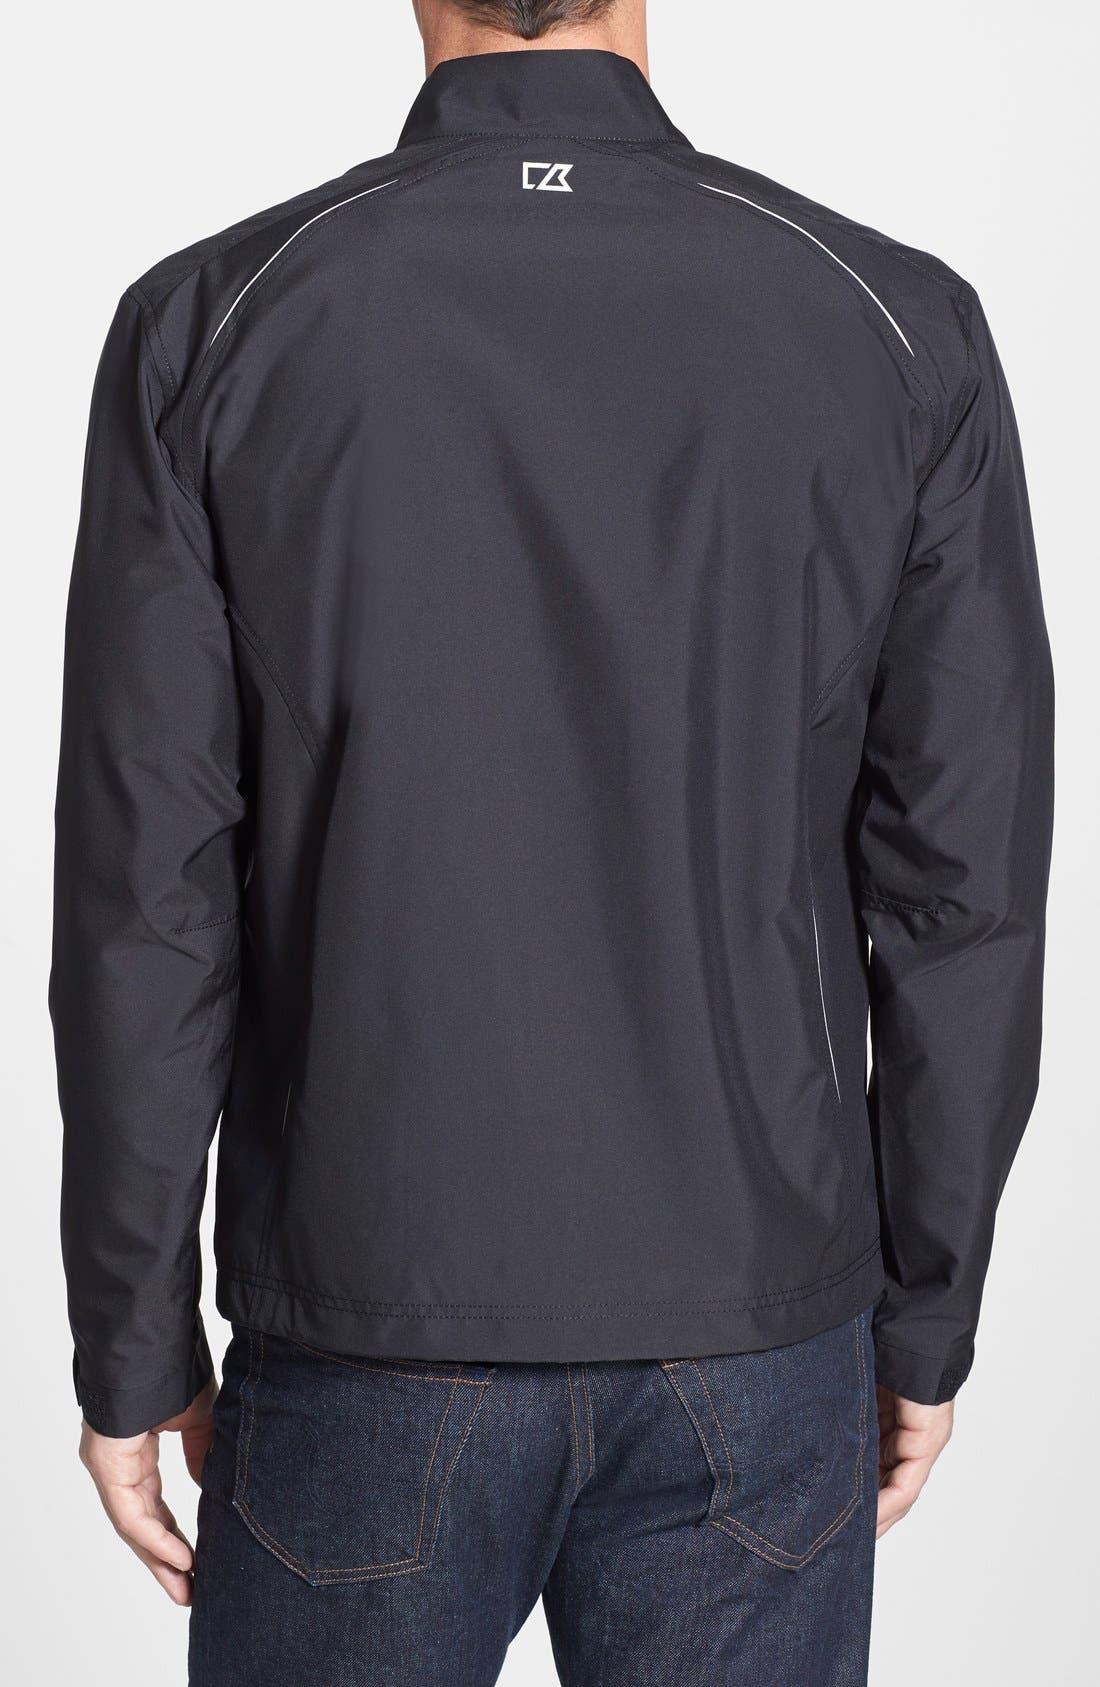 Alternate Image 2  - Cutter & Buck Philadelphia Eagles - Beacon WeatherTec Wind & Water Resistant Jacket